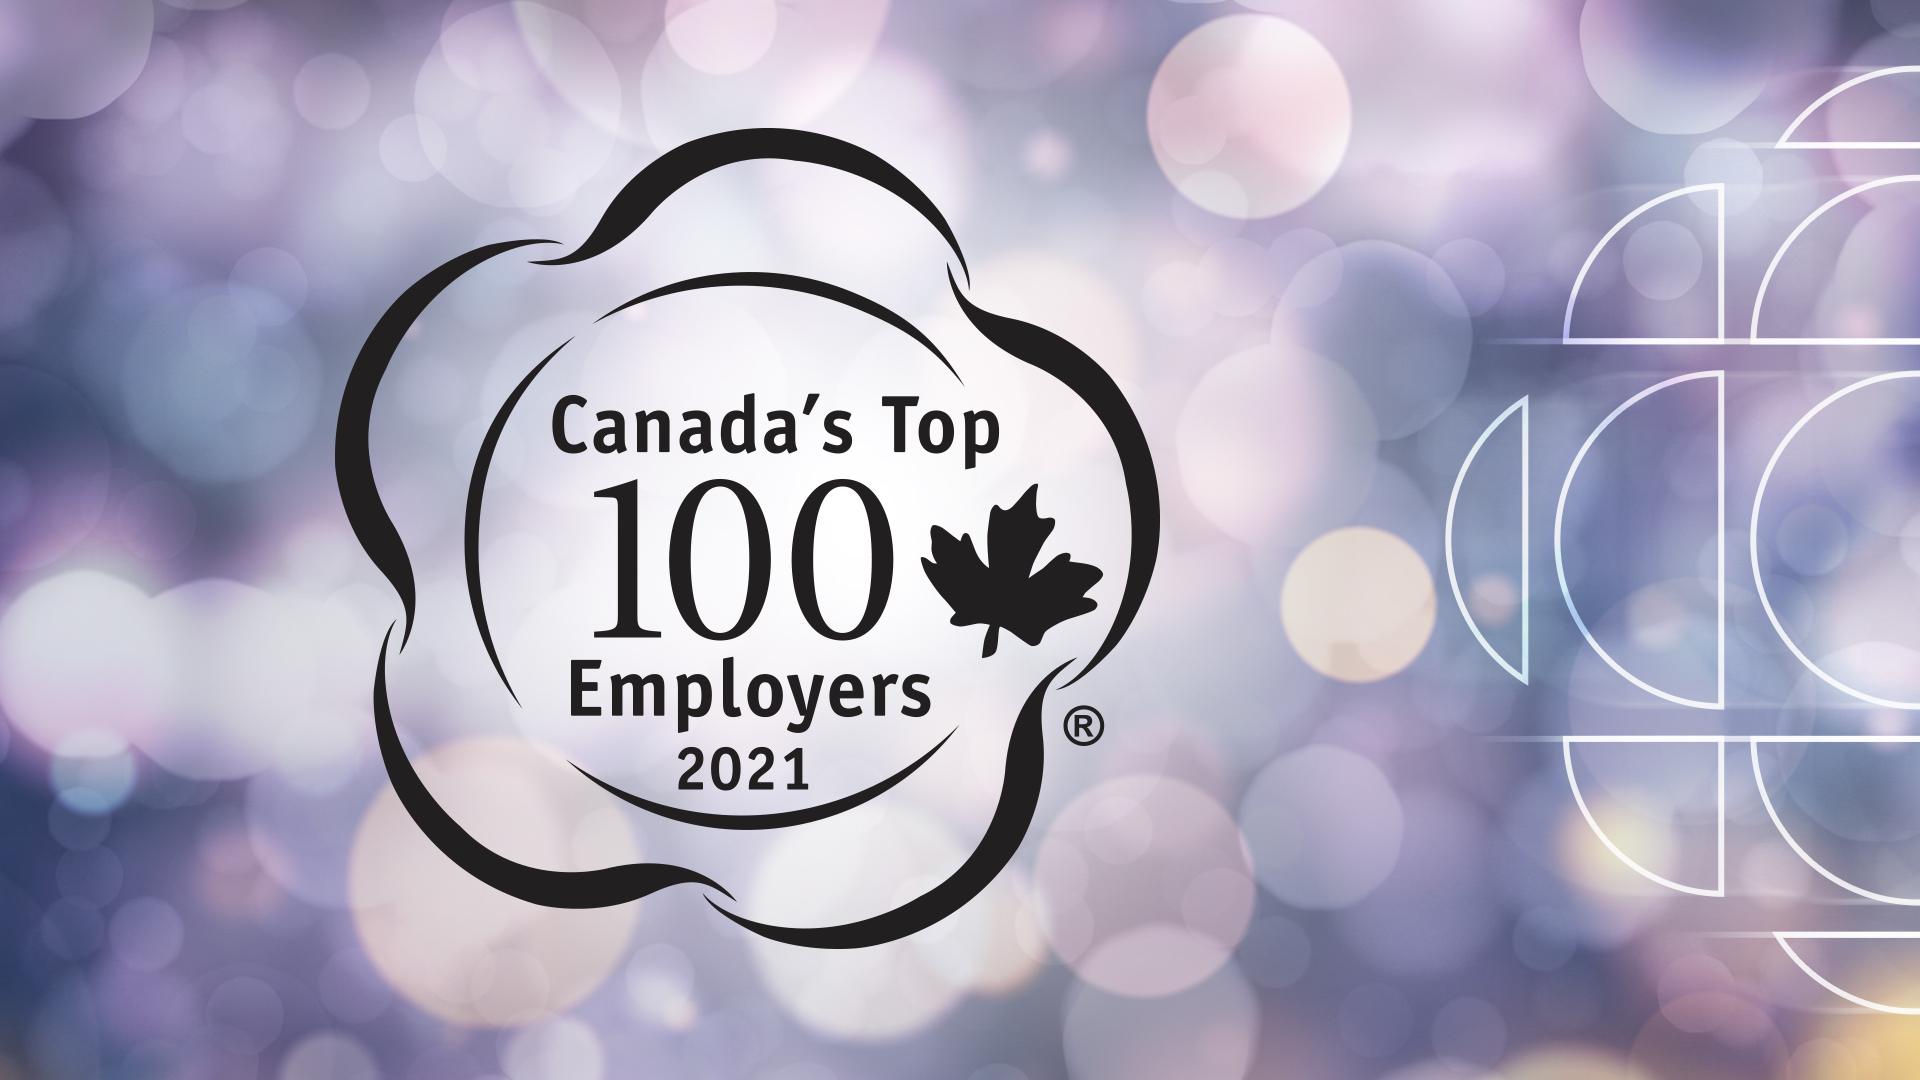 CBC/Radio-Canada recognized among Canada's Top 100 Employers - CBC/Radio- Canada